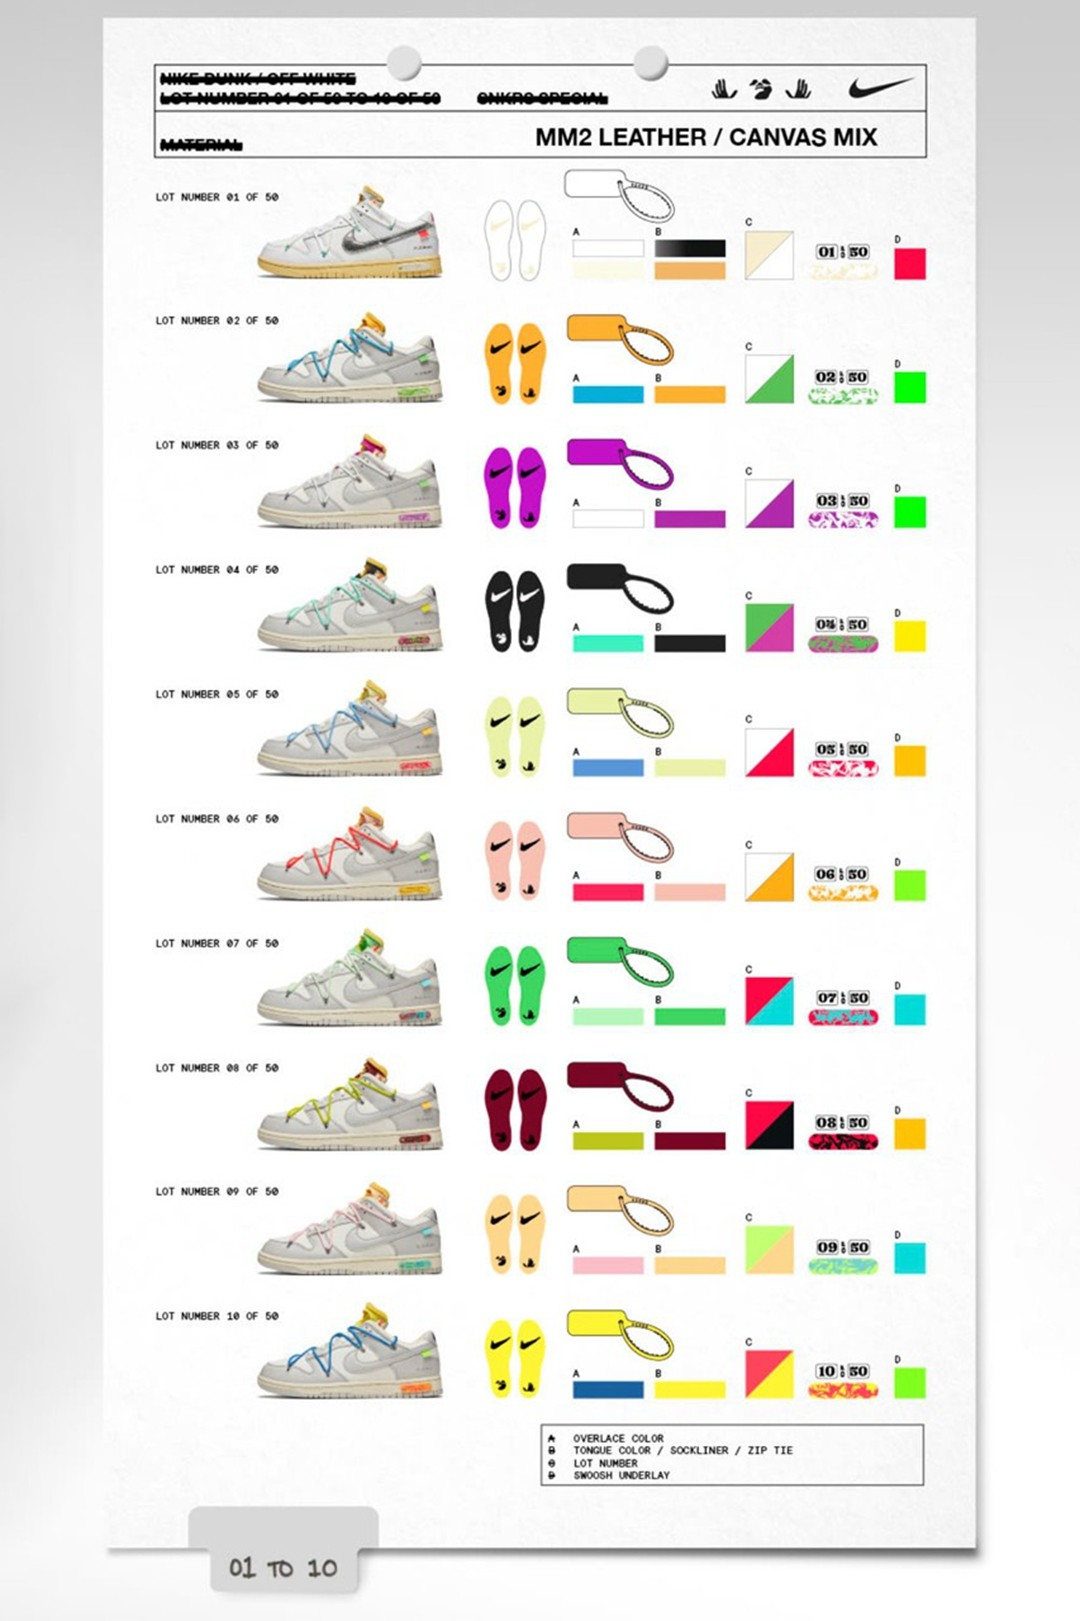 OFF-WHITE,Dunk,Nike,发售  官方开箱来了!OW x Dunk 鞋盒超特别!即将专属发售!